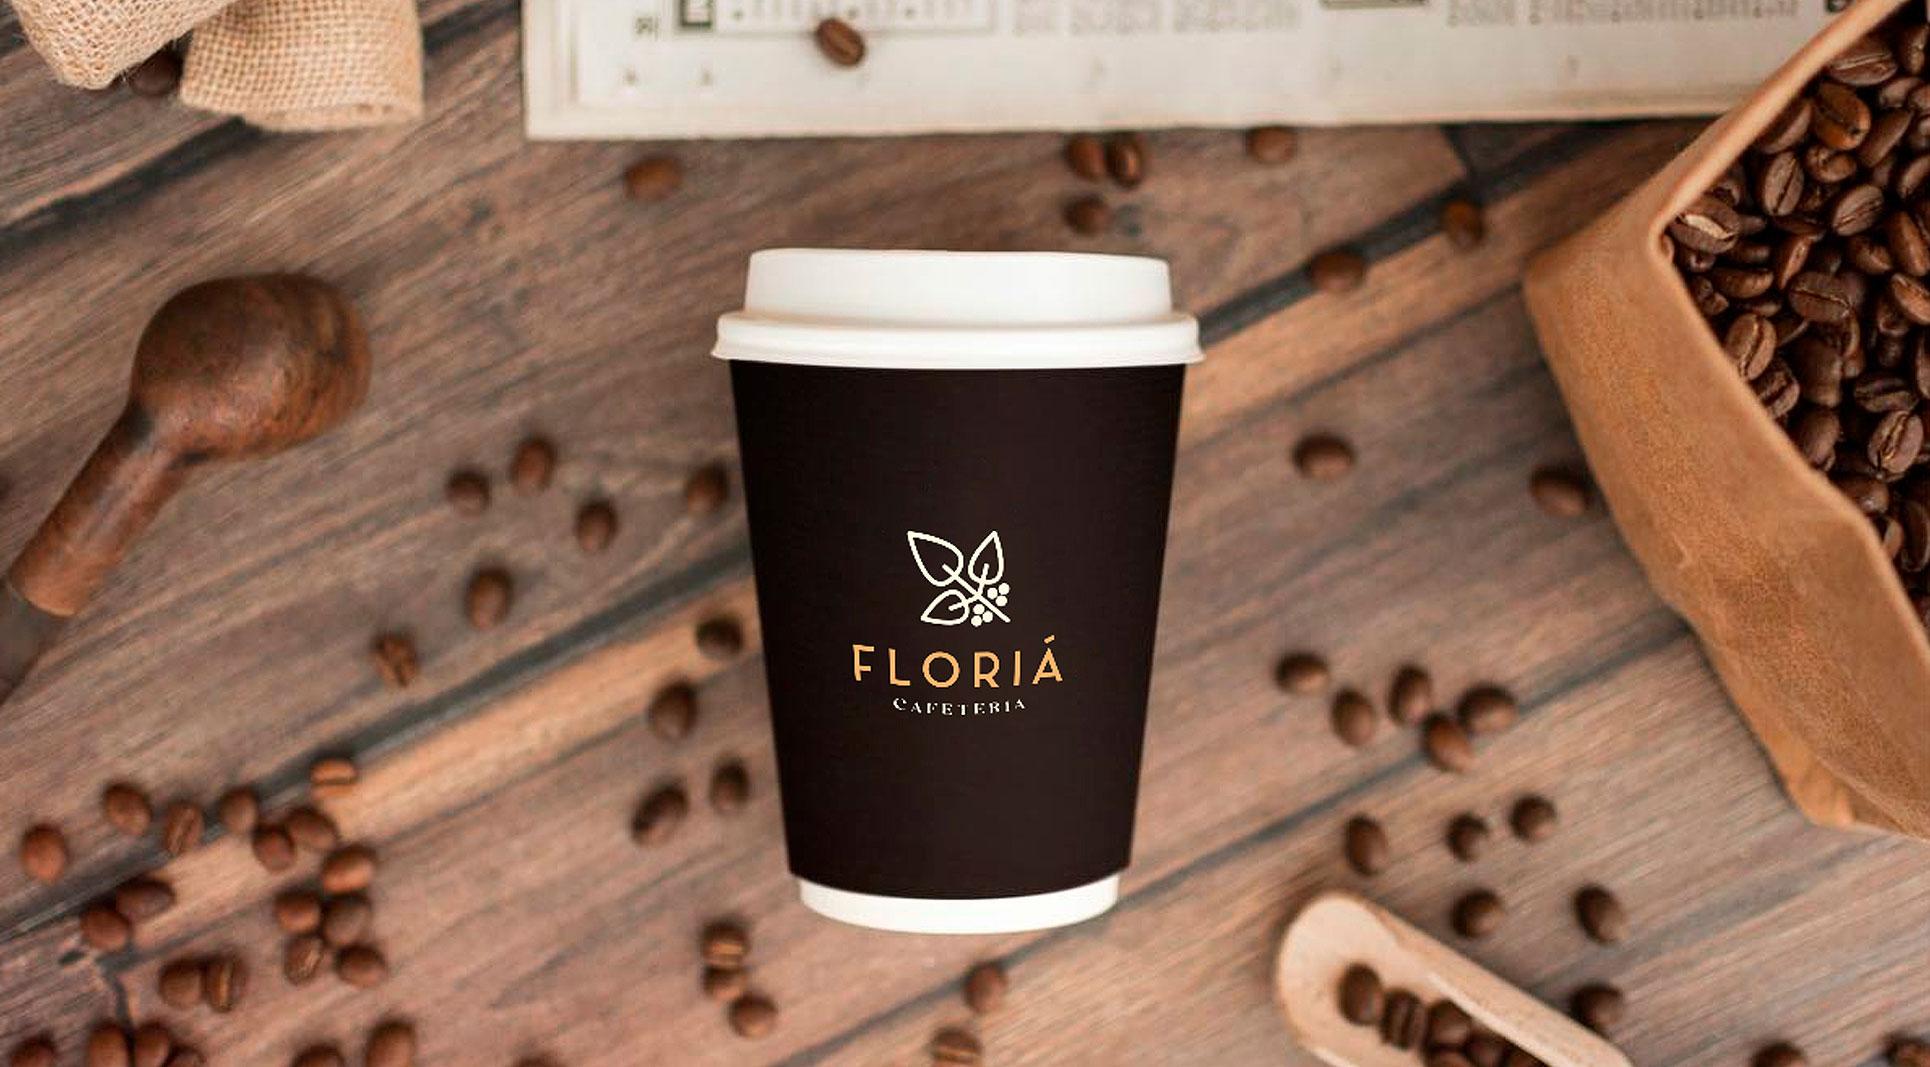 Floriá Cafeteria